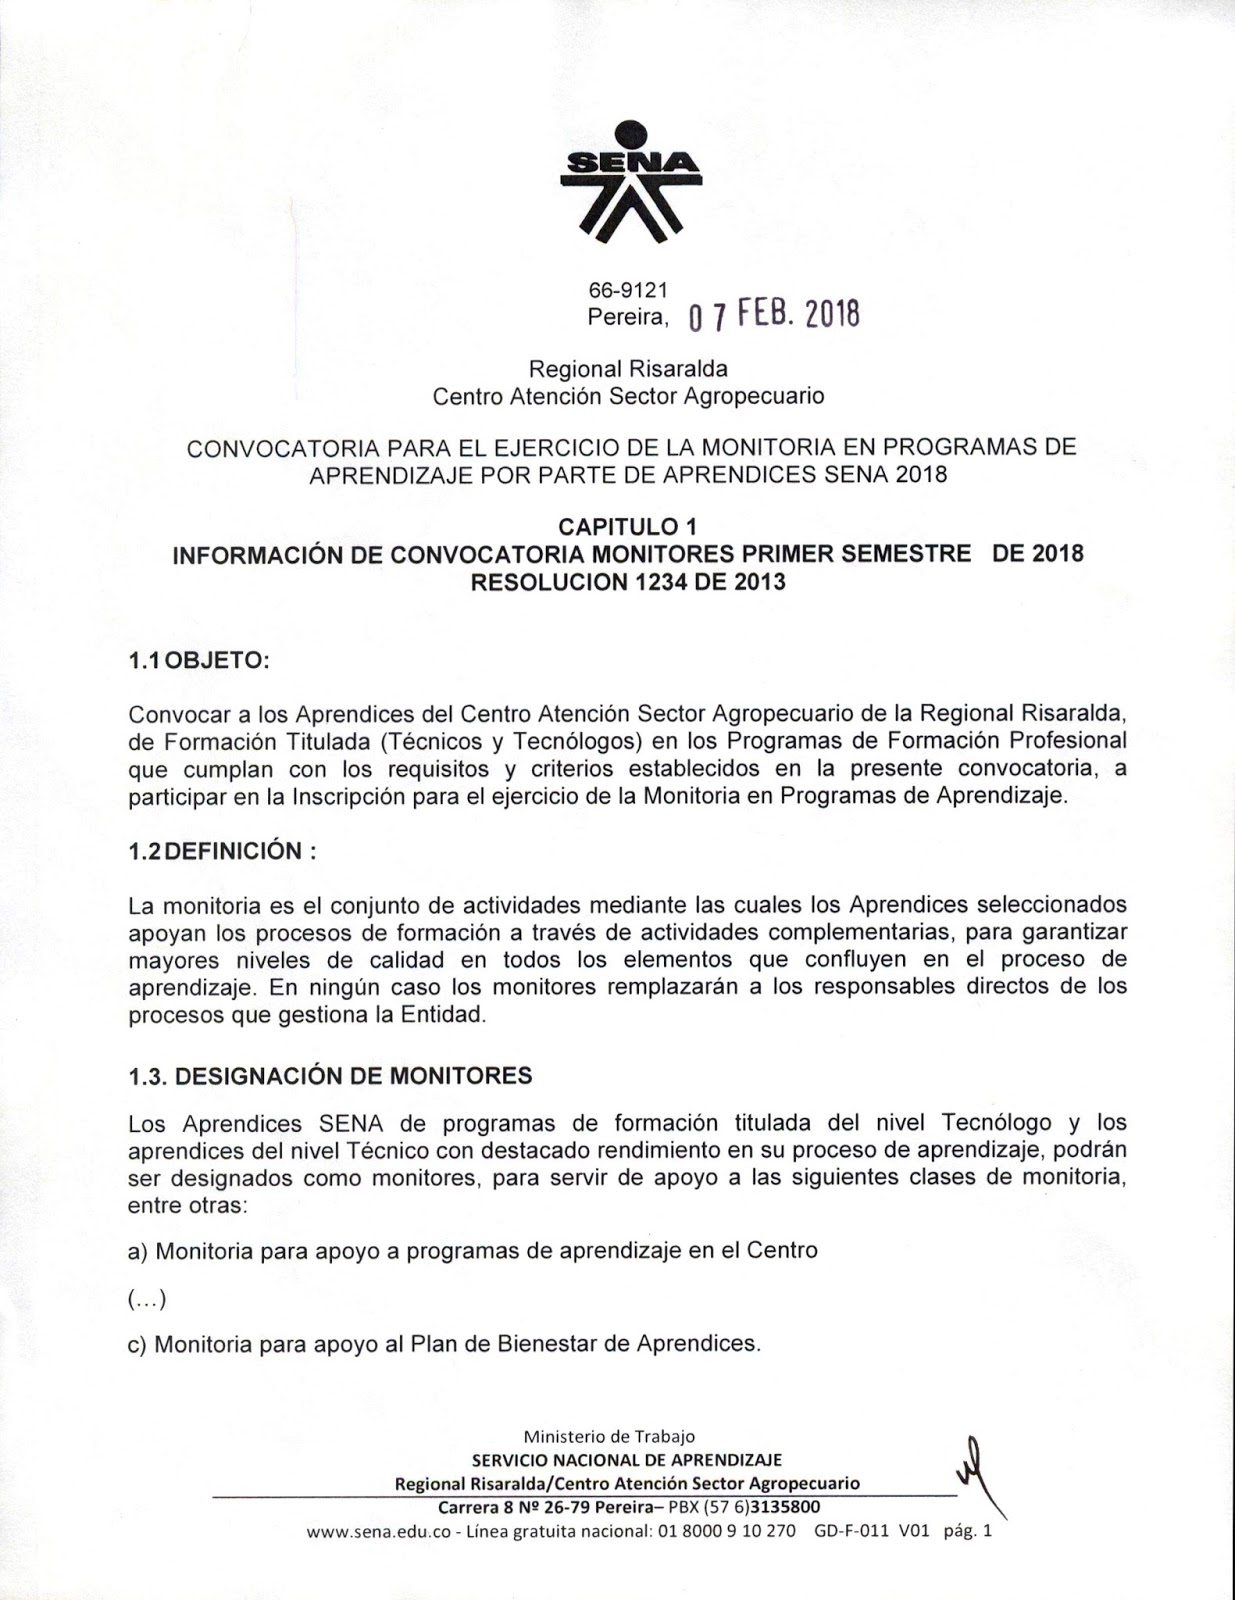 Centro De Atencion Al Sector Agropecuario